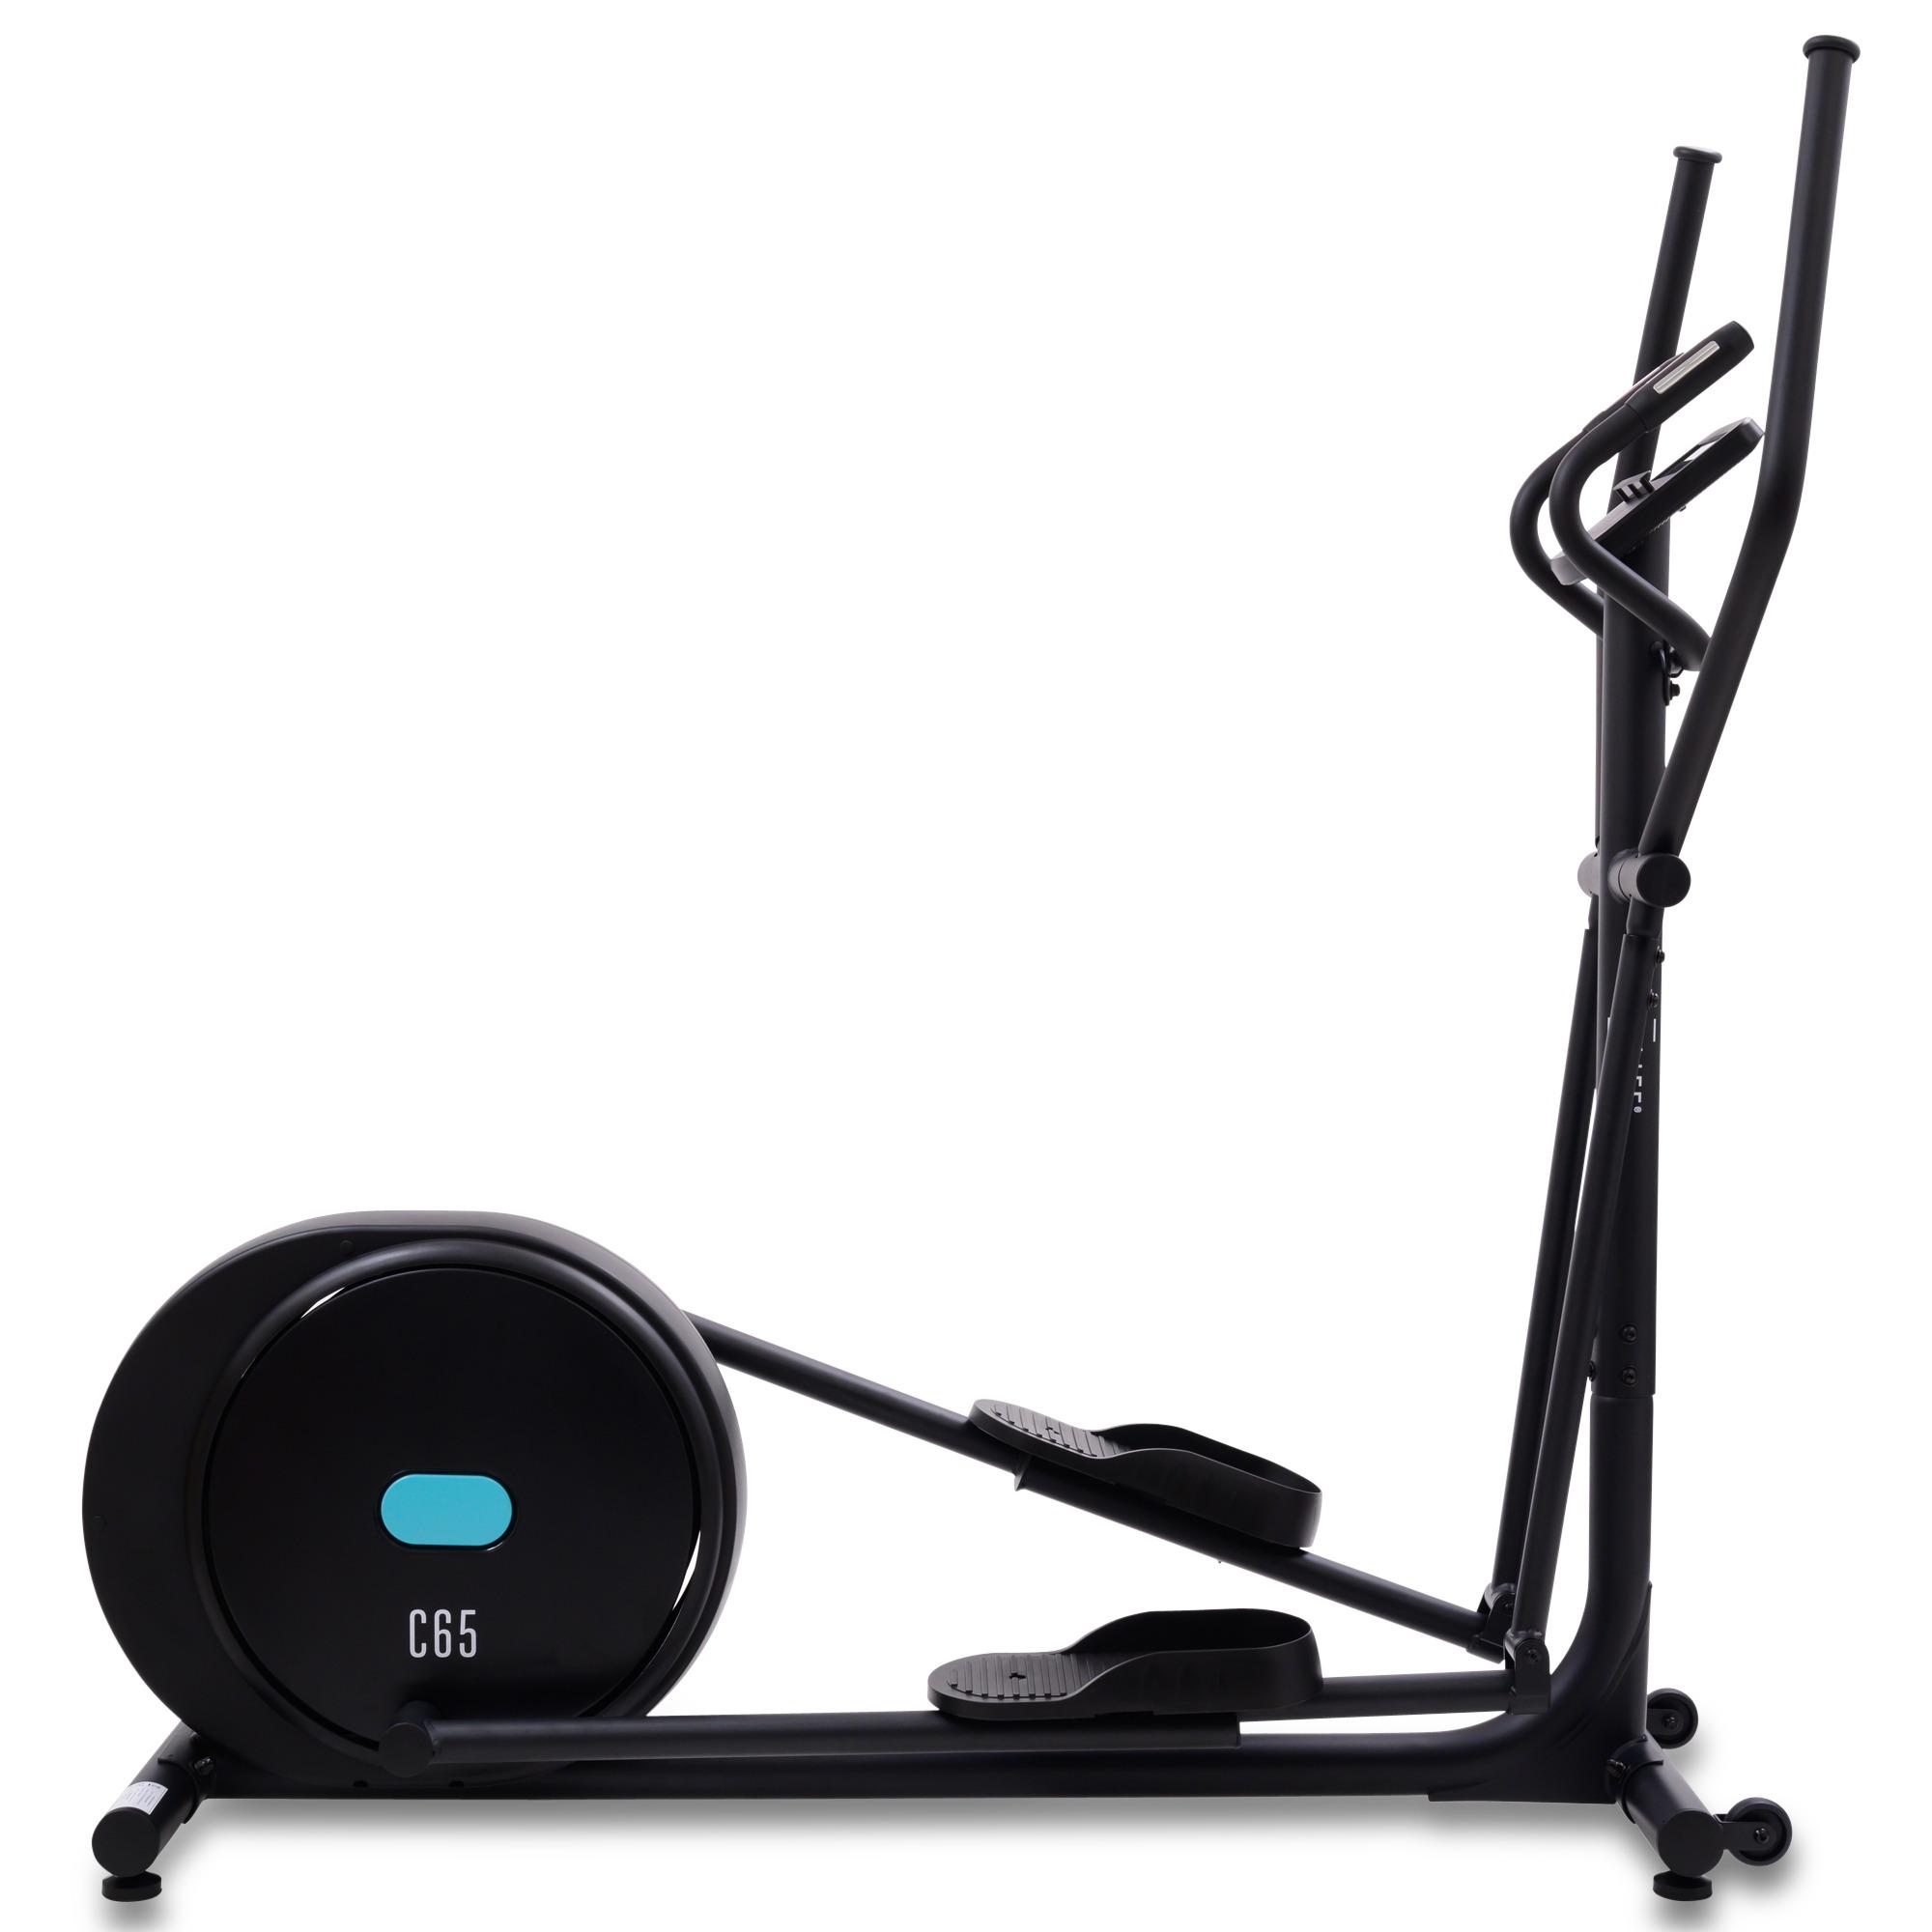 Titan Fitness Crosstrainer C65